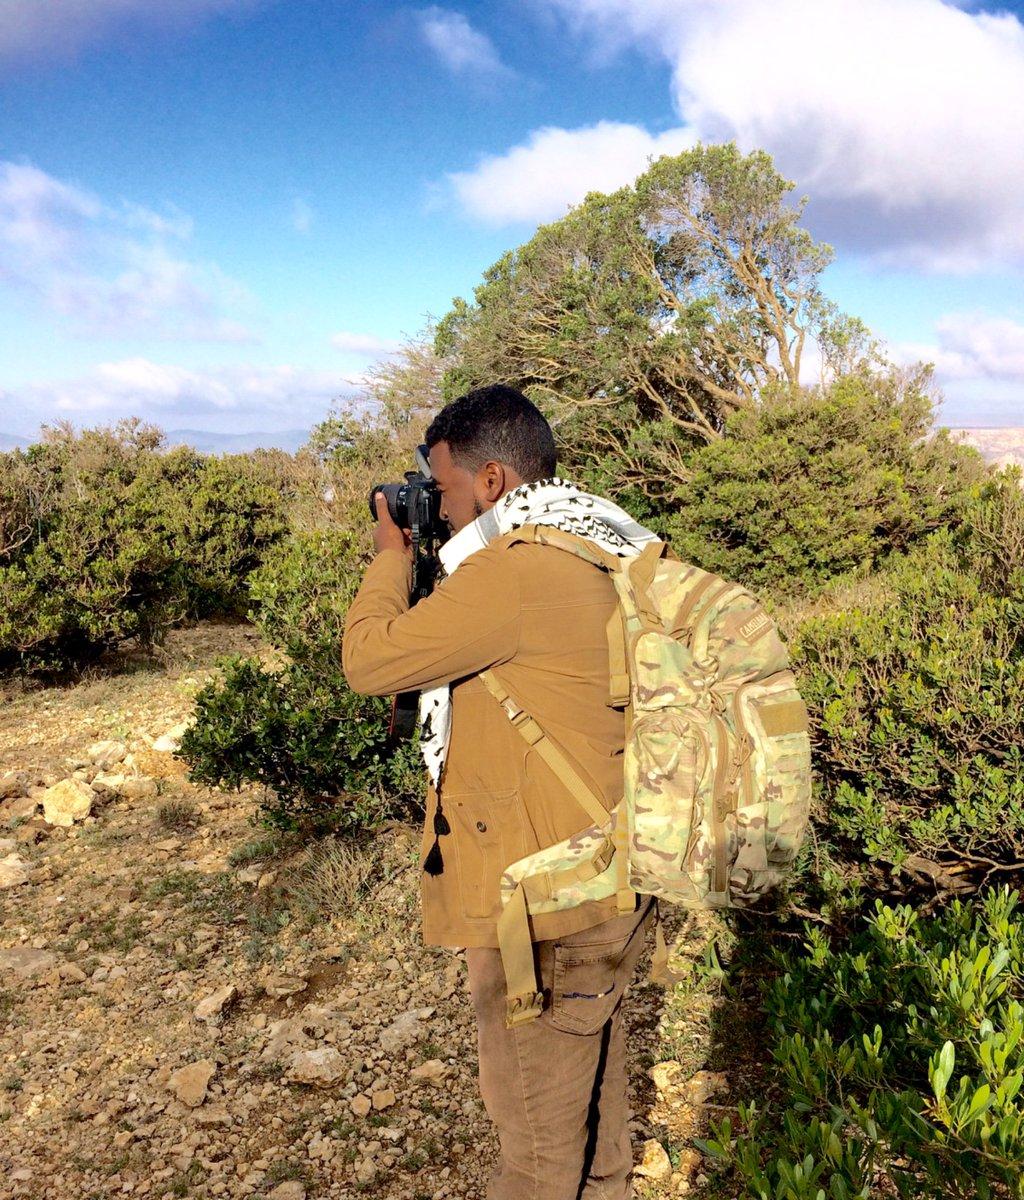 I love my country only when I'm on vacation. 😂LocalBoy Marka iska tahay😅 #GacanLibaax #Somaliland #Safari https://t.co/V250dSITim